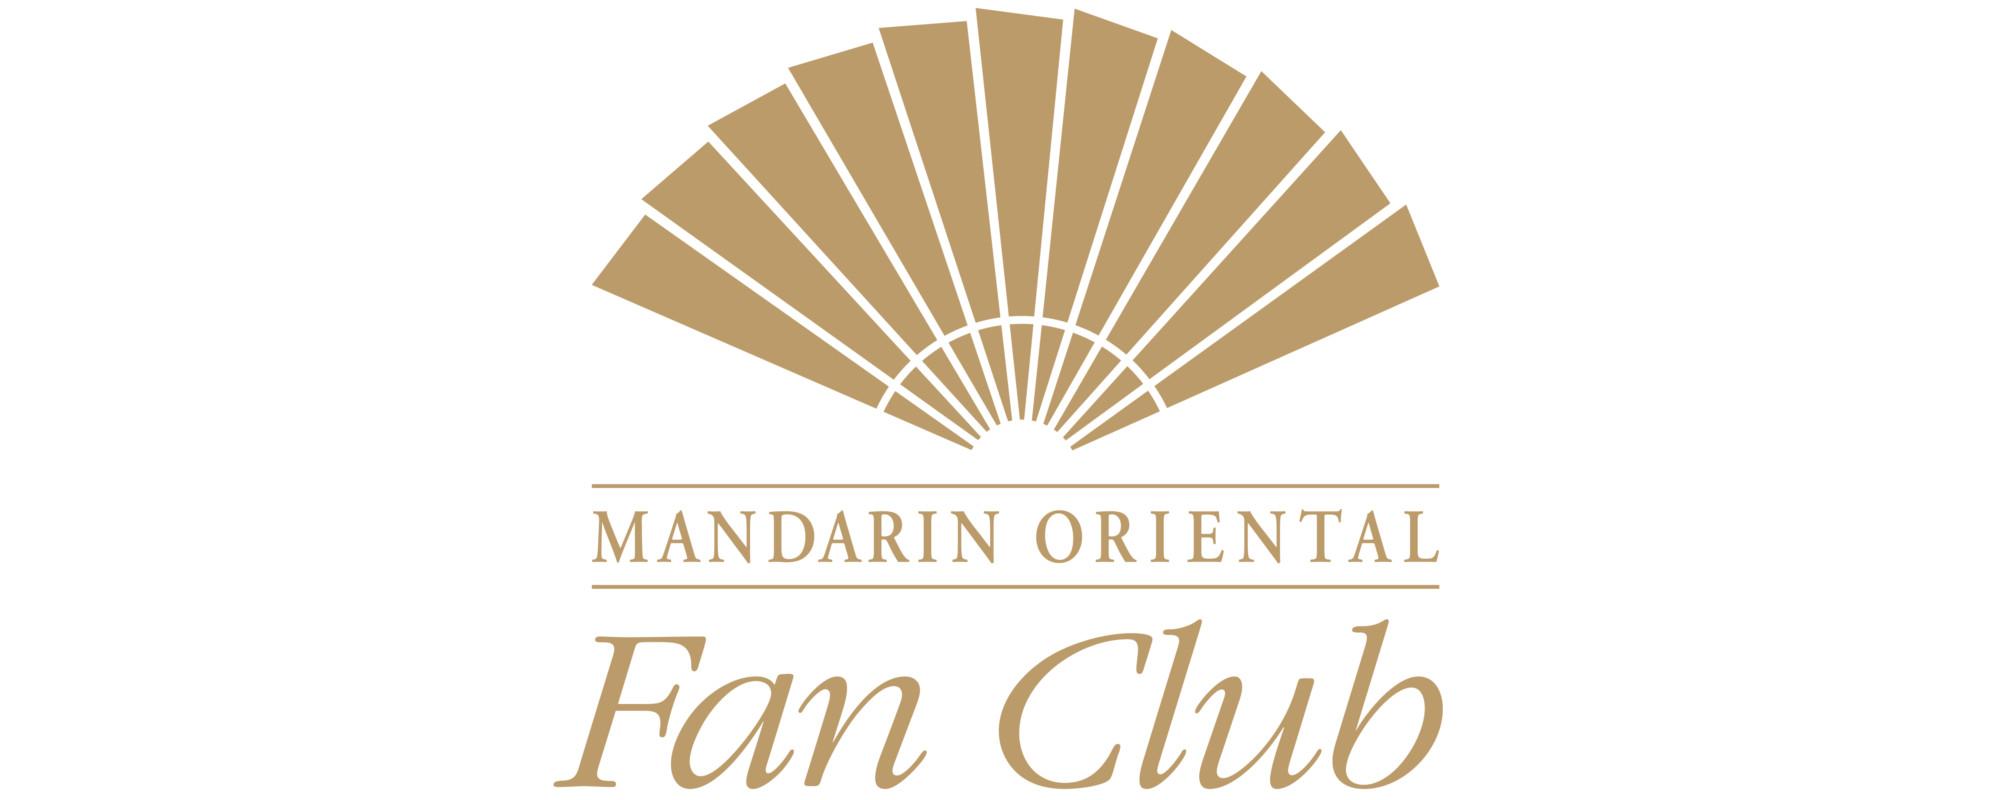 Mandarin-Oriental-fan-club.jpg